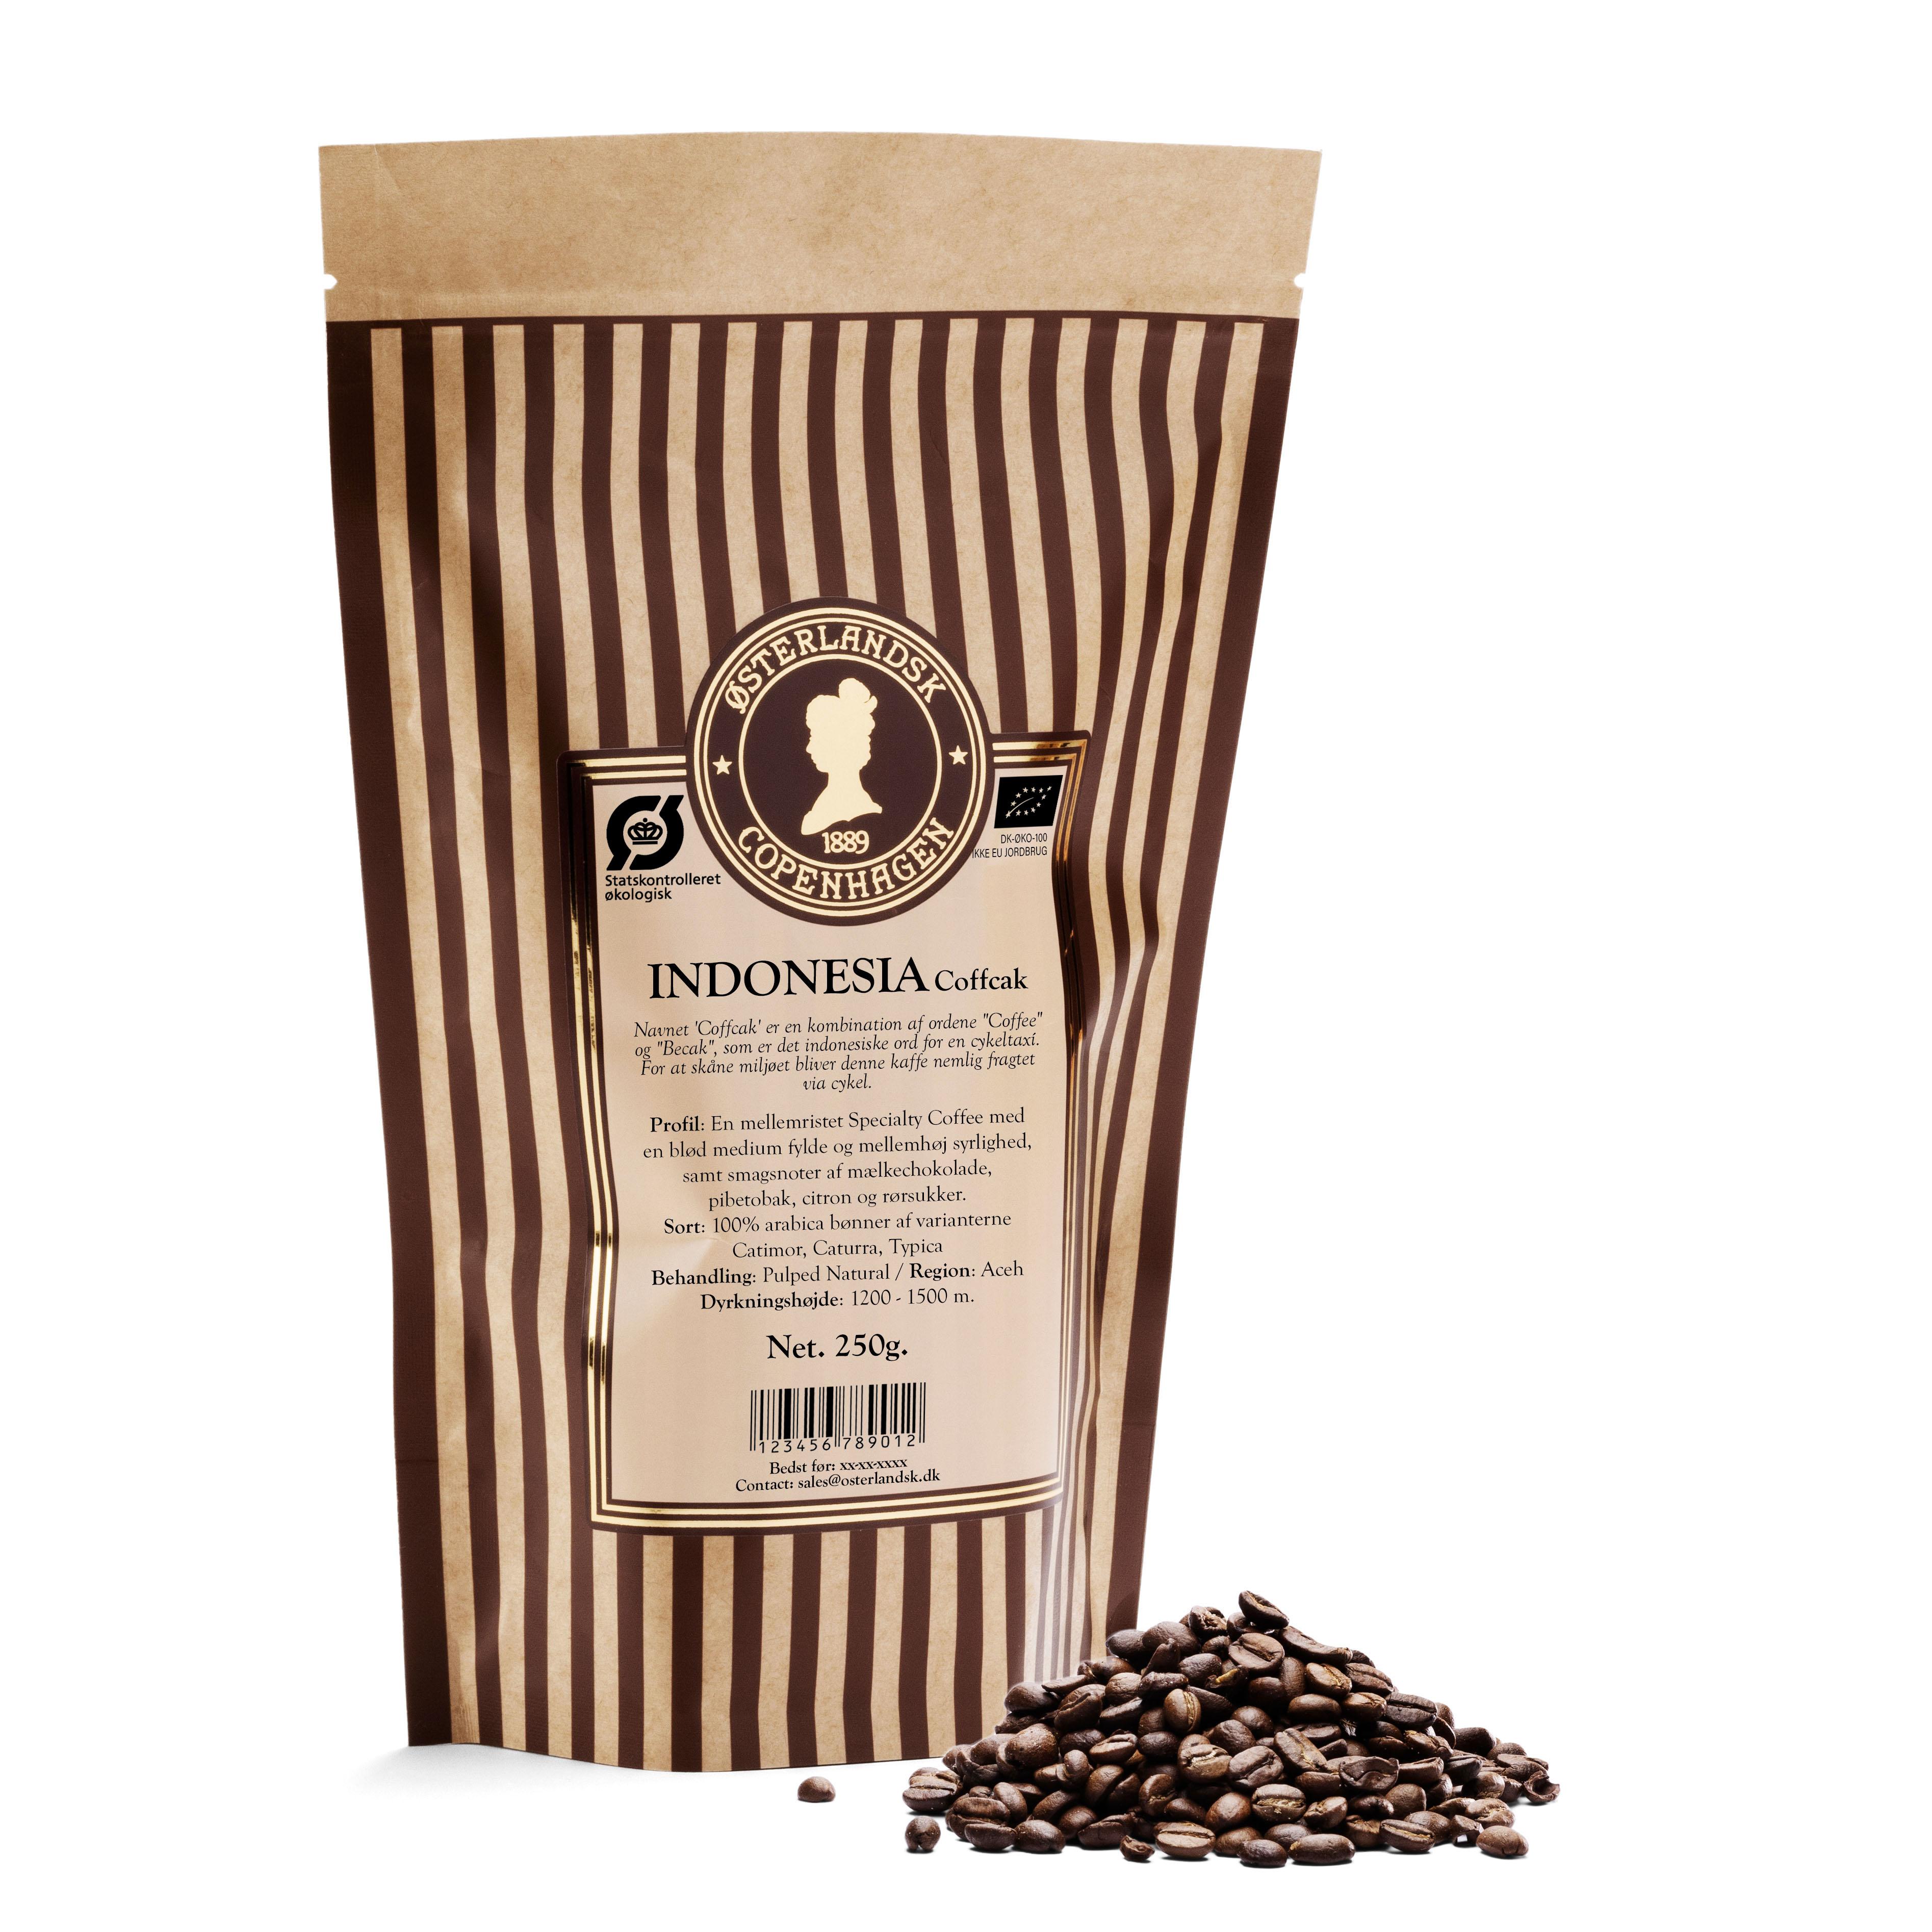 Indonesia Sumatra kaffe 250g, økologisk